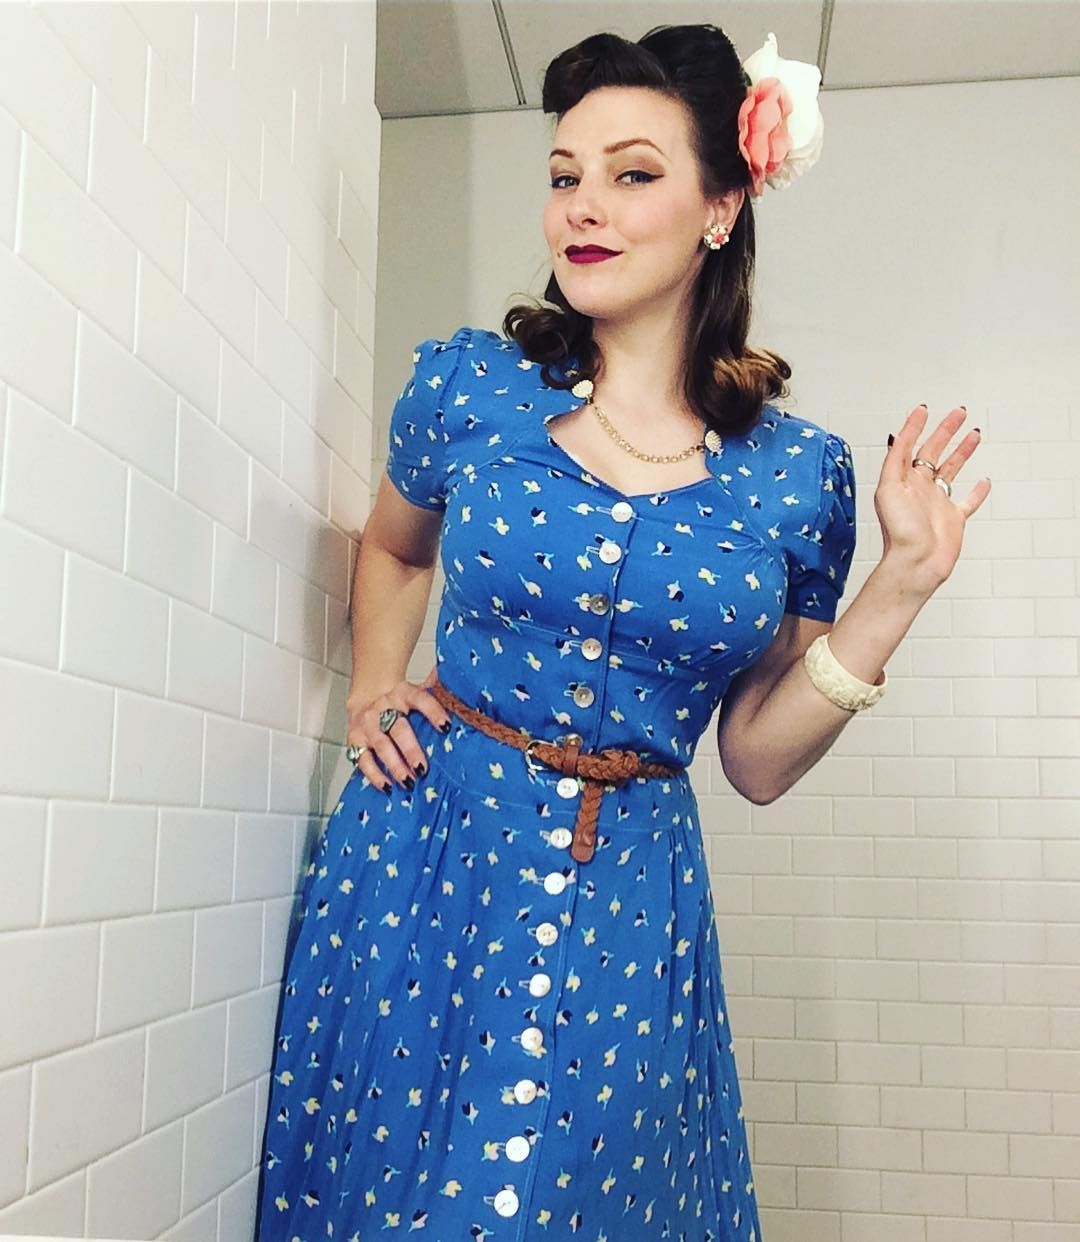 a58e2b59deed9 Colette Ceylon dress by @_hellinheels_ | Colette Patterns sewing ...